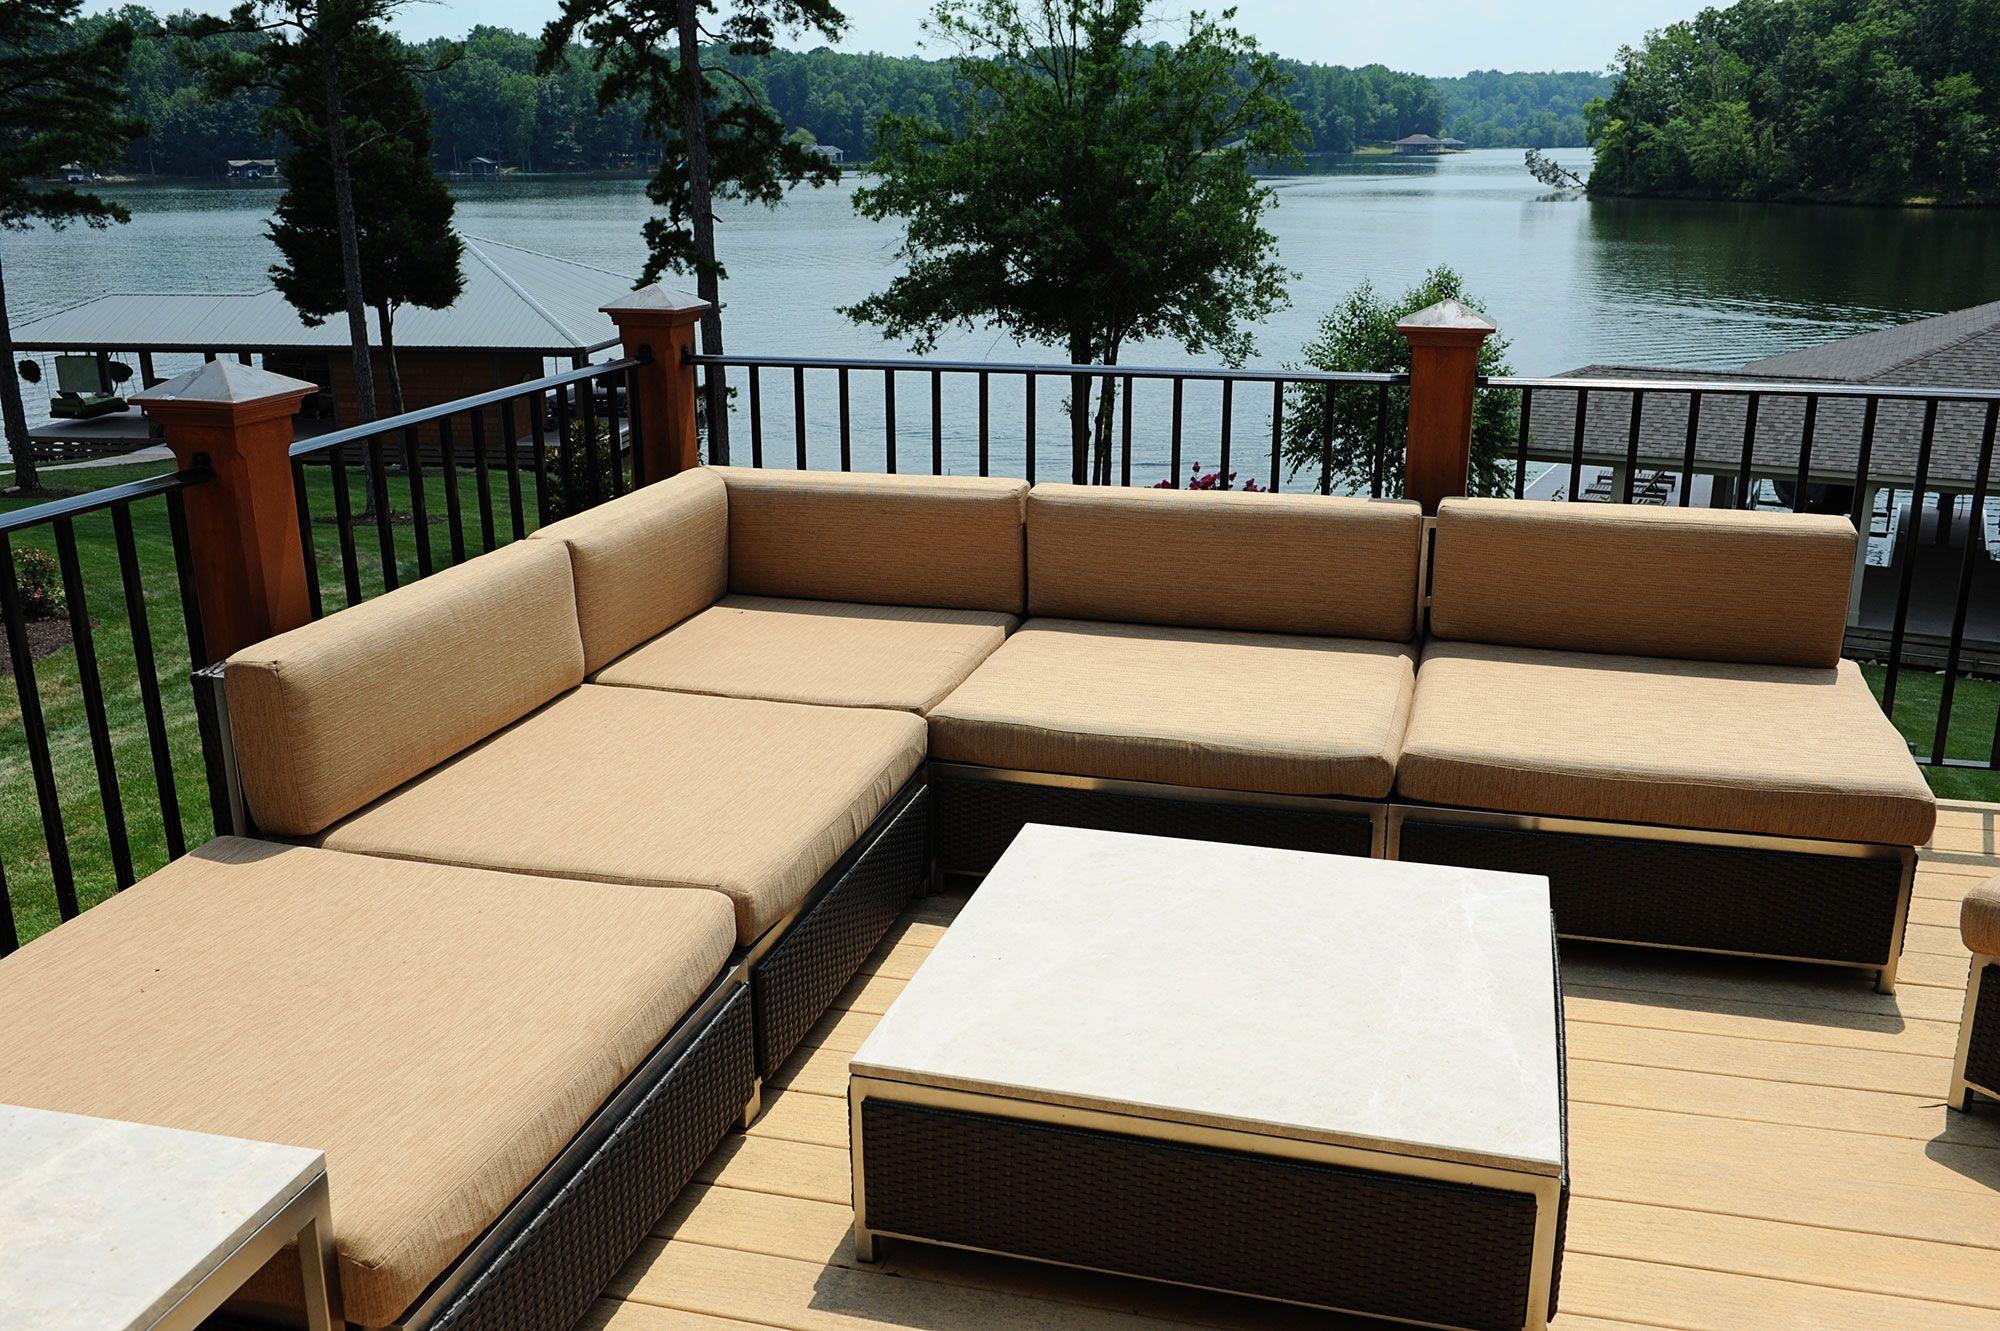 Delightful Tropitoneu0027s Cabana Club Modular Furniture And Tables With Woven Panels  Designed By Bridgett Mazer Interiors